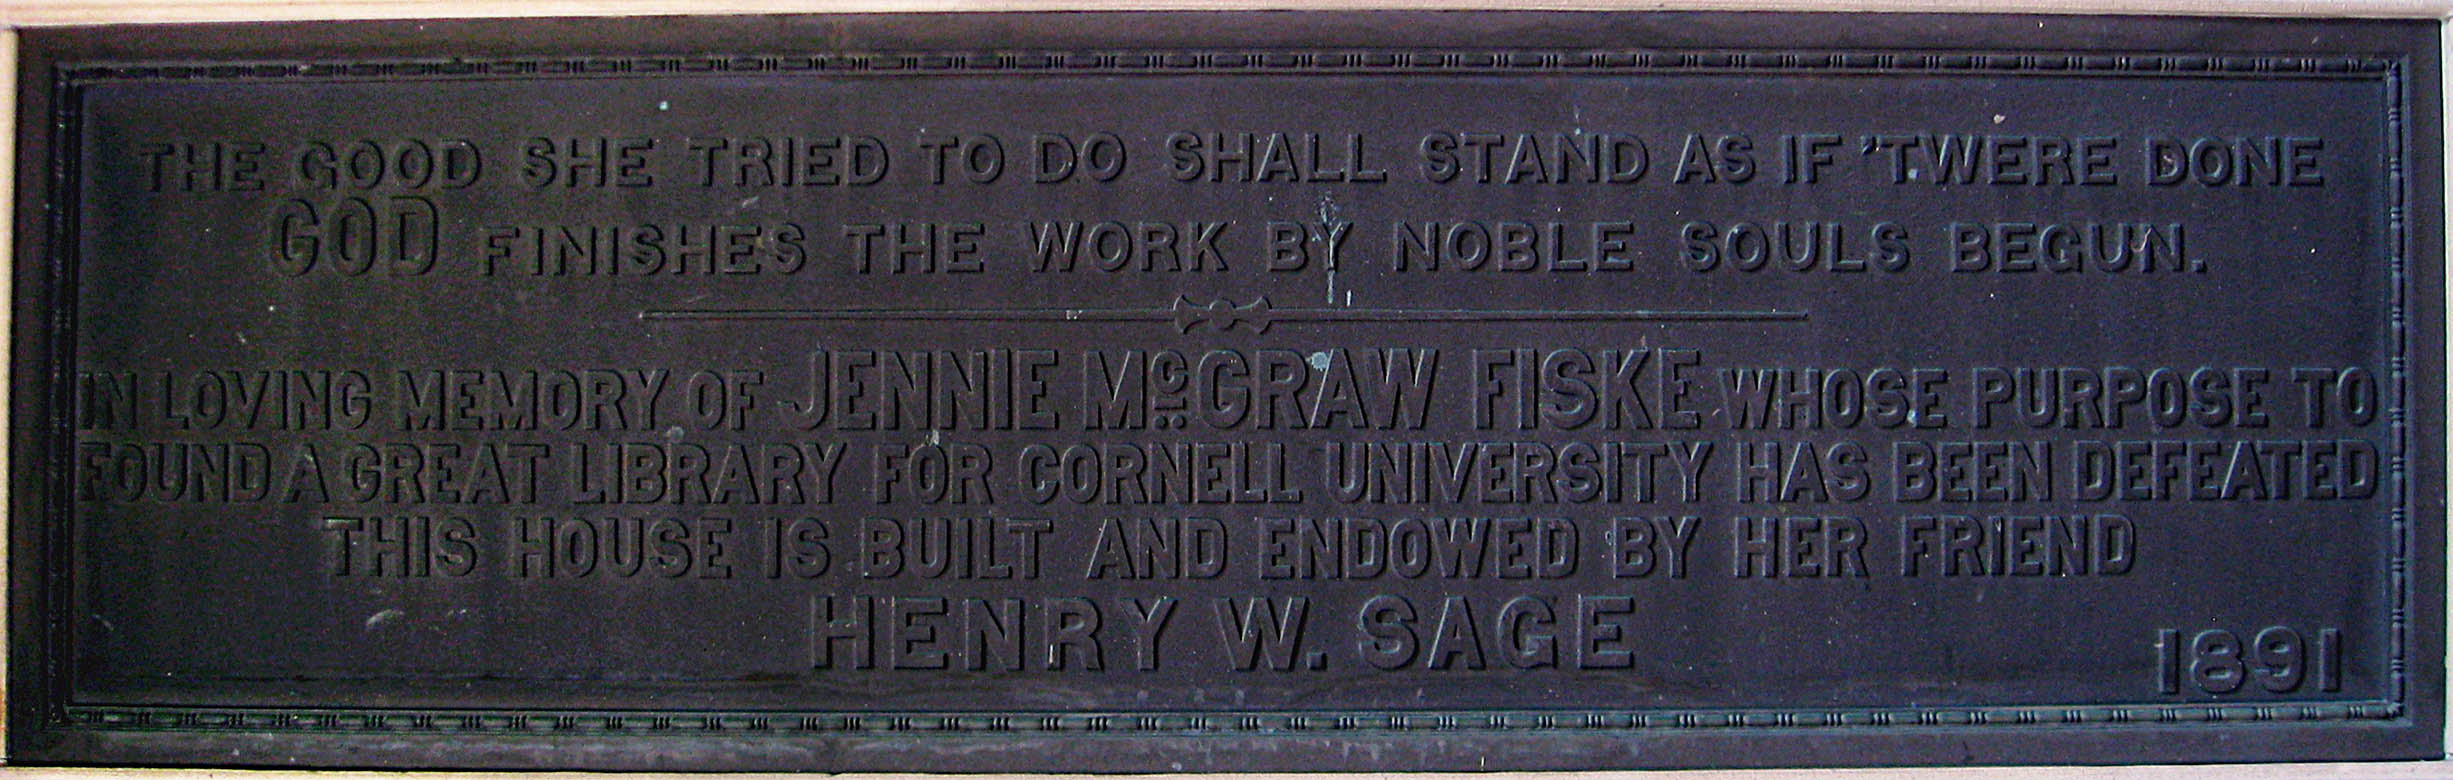 hospital dedication plaque example